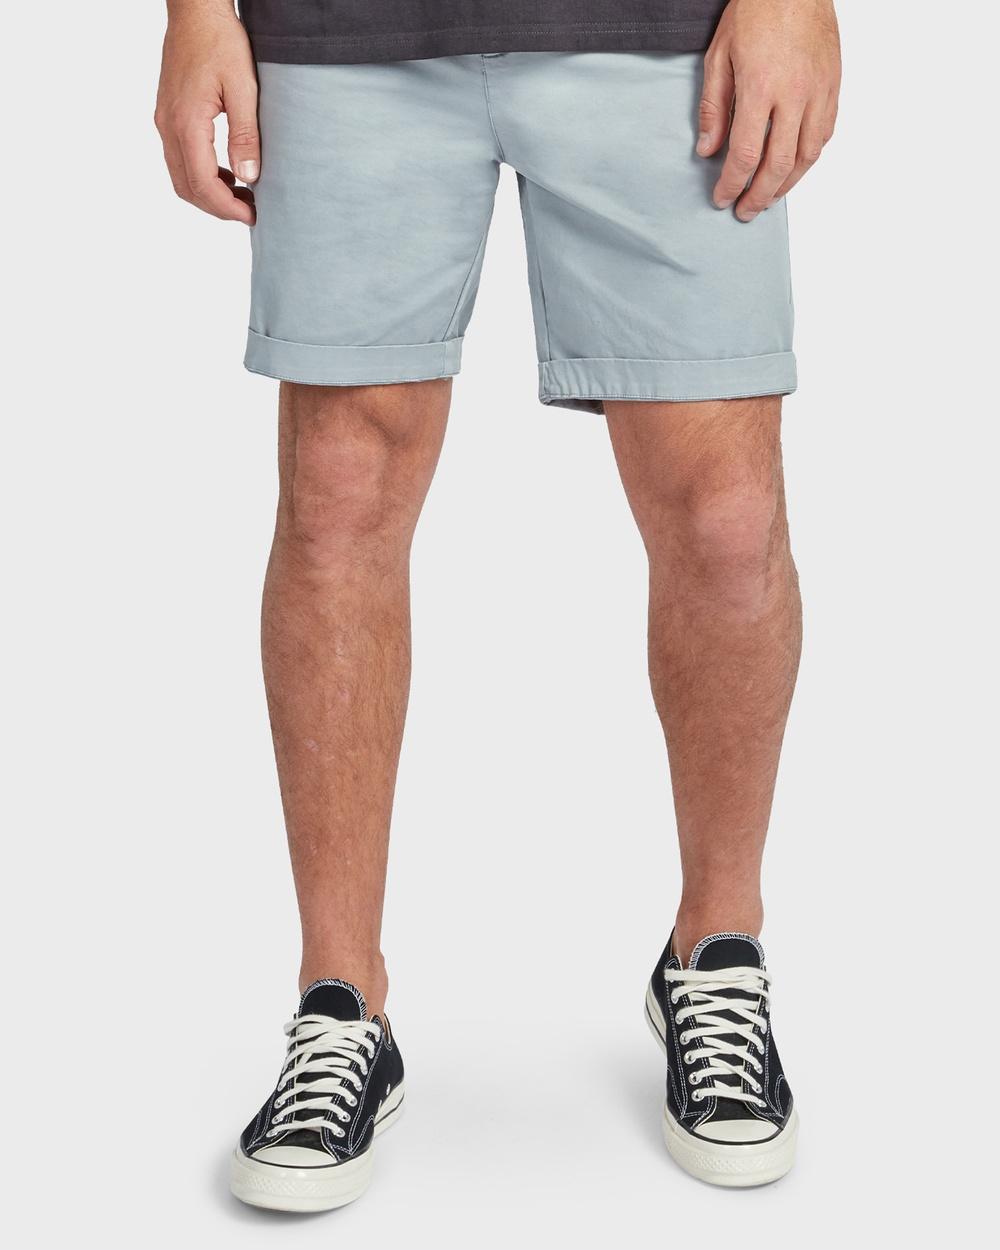 Academy Brand Cooper Chino Short Shorts Blue